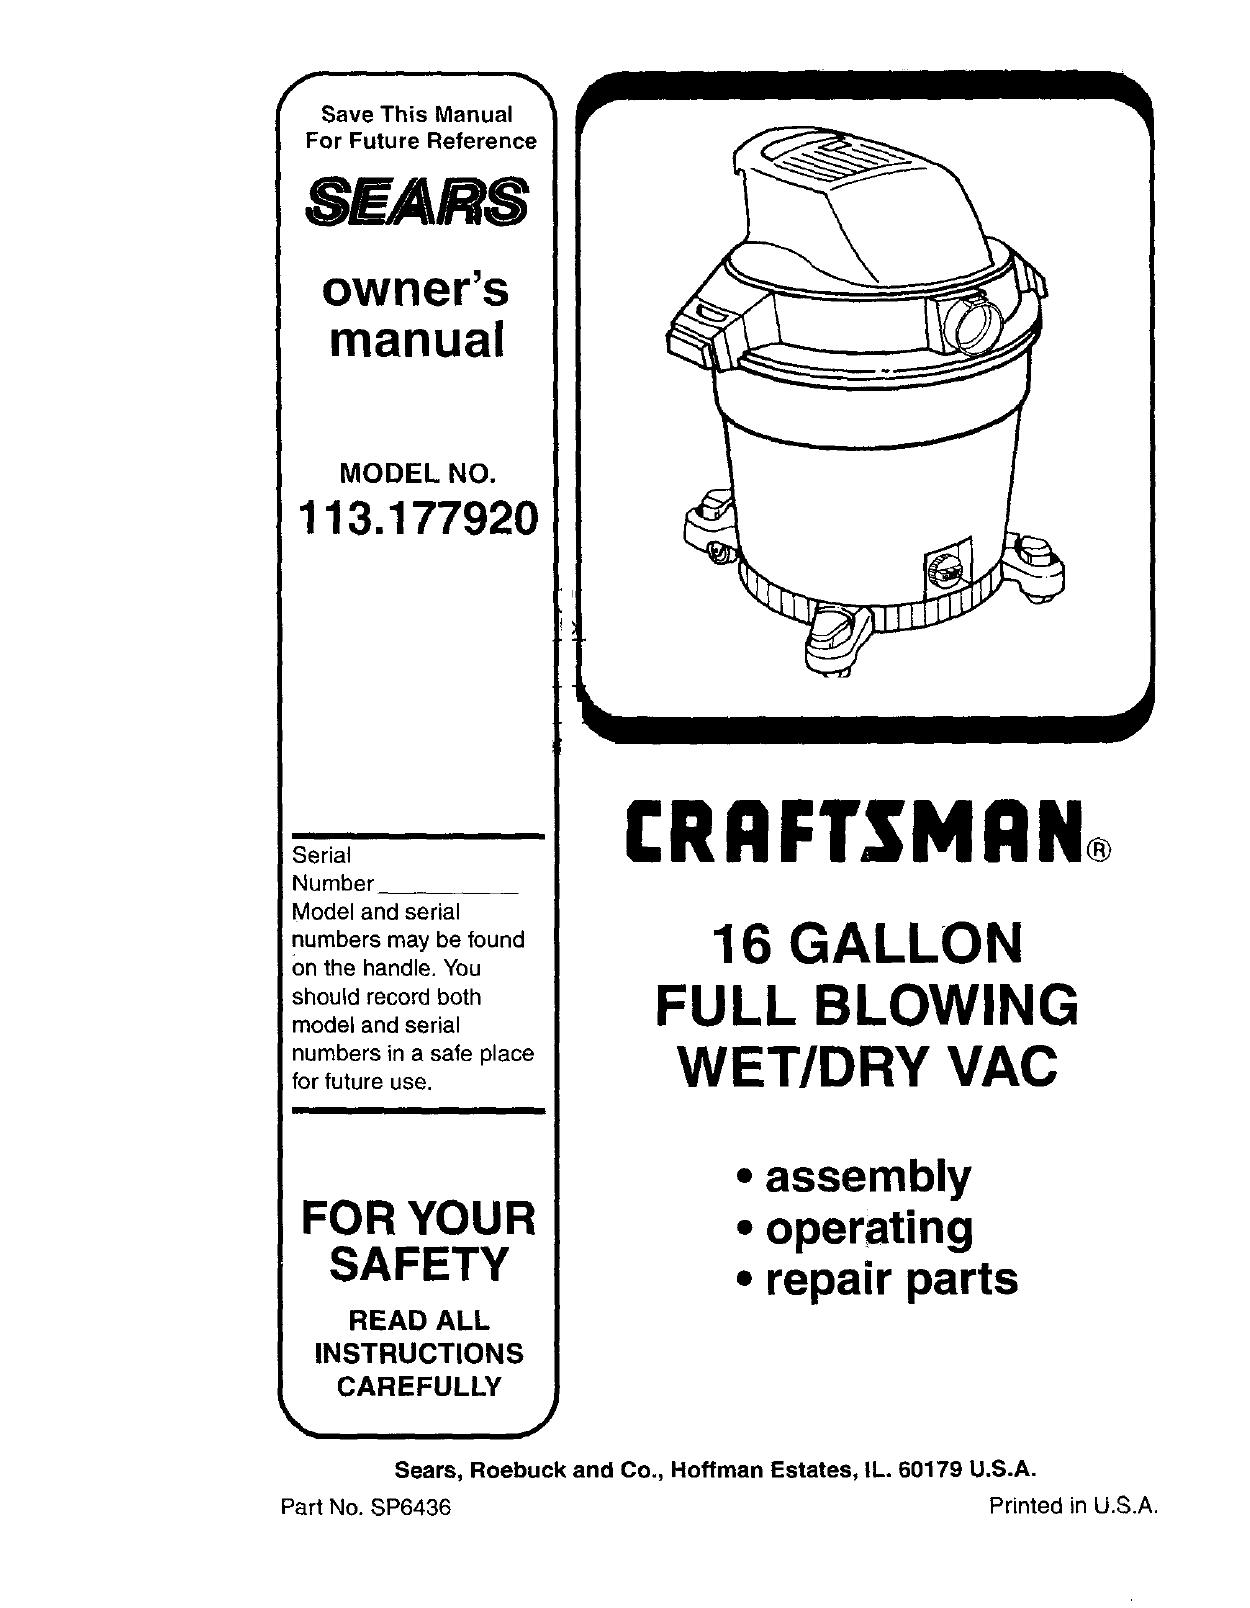 Craftsman 113177920 User Manual 16 WET/DRY VAC Manuals And